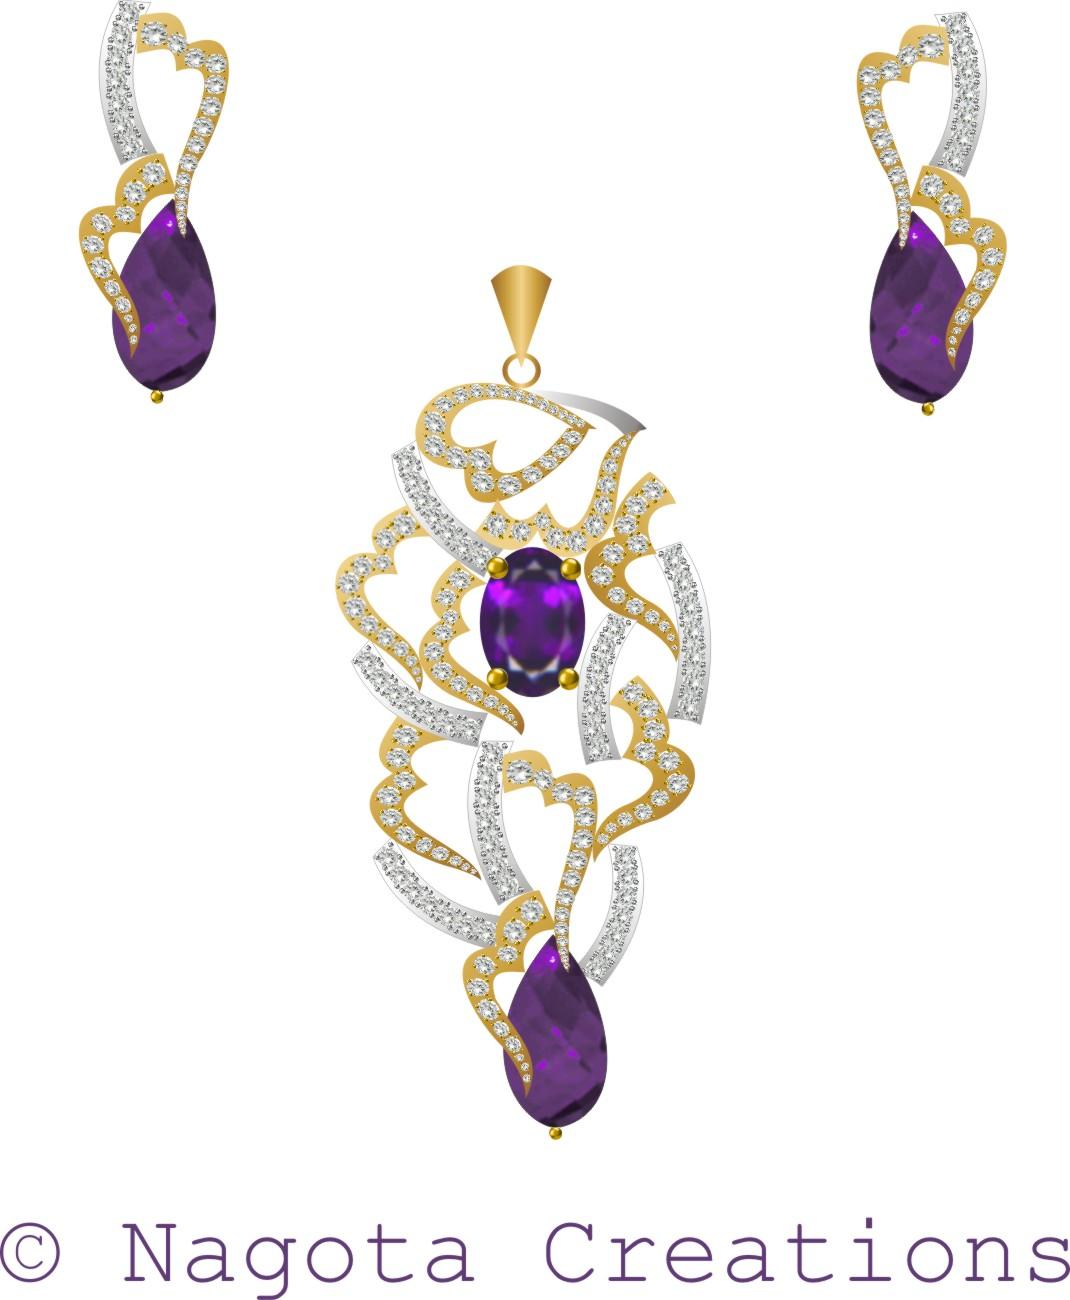 Amethyst and diamond pendant set with yellow and white gold amethyst and diamond pendant set with yellow and white gold mozeypictures Image collections